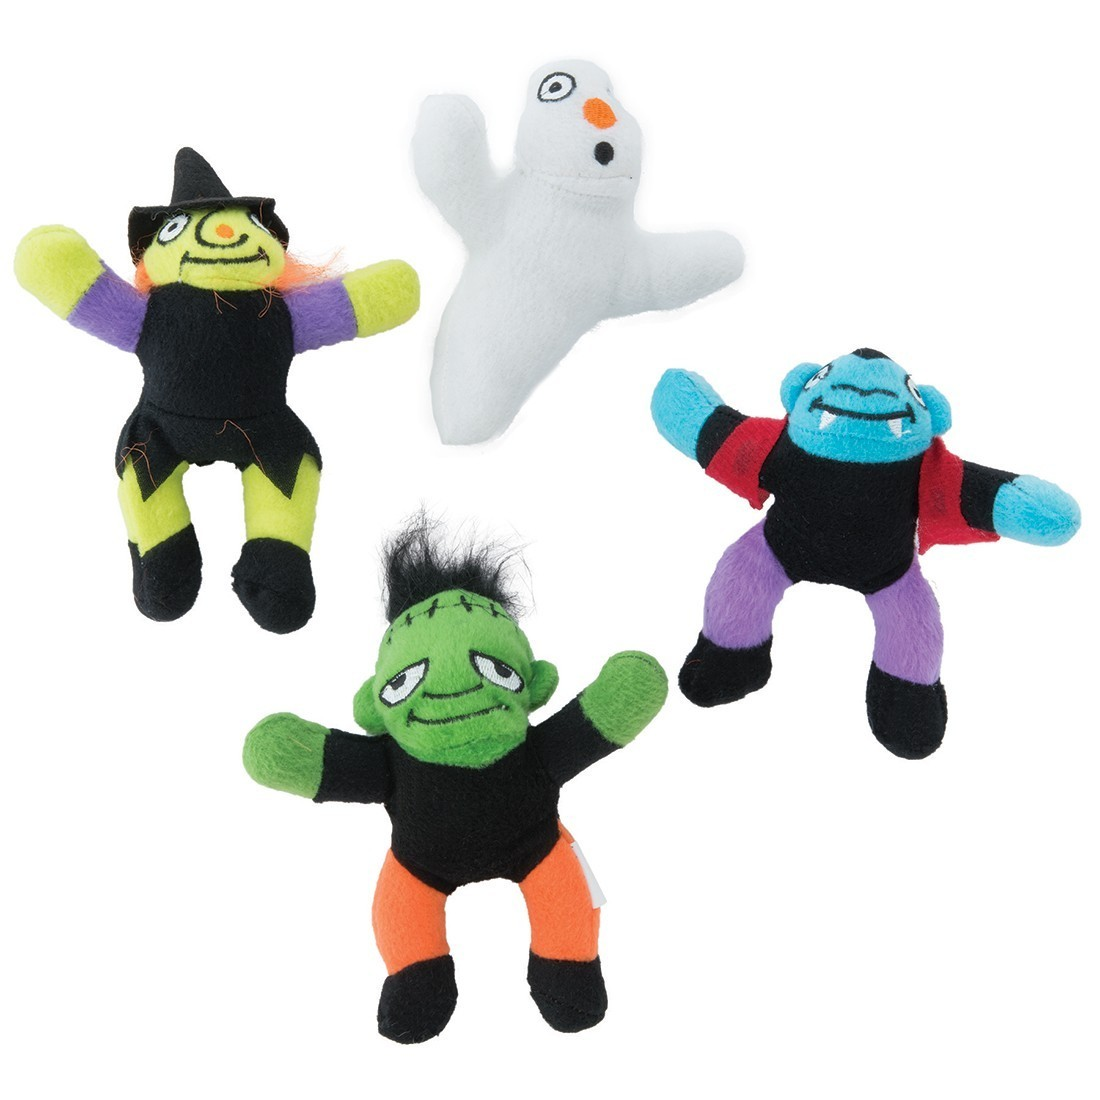 Plush Bean Bag Halloween Characters [image]